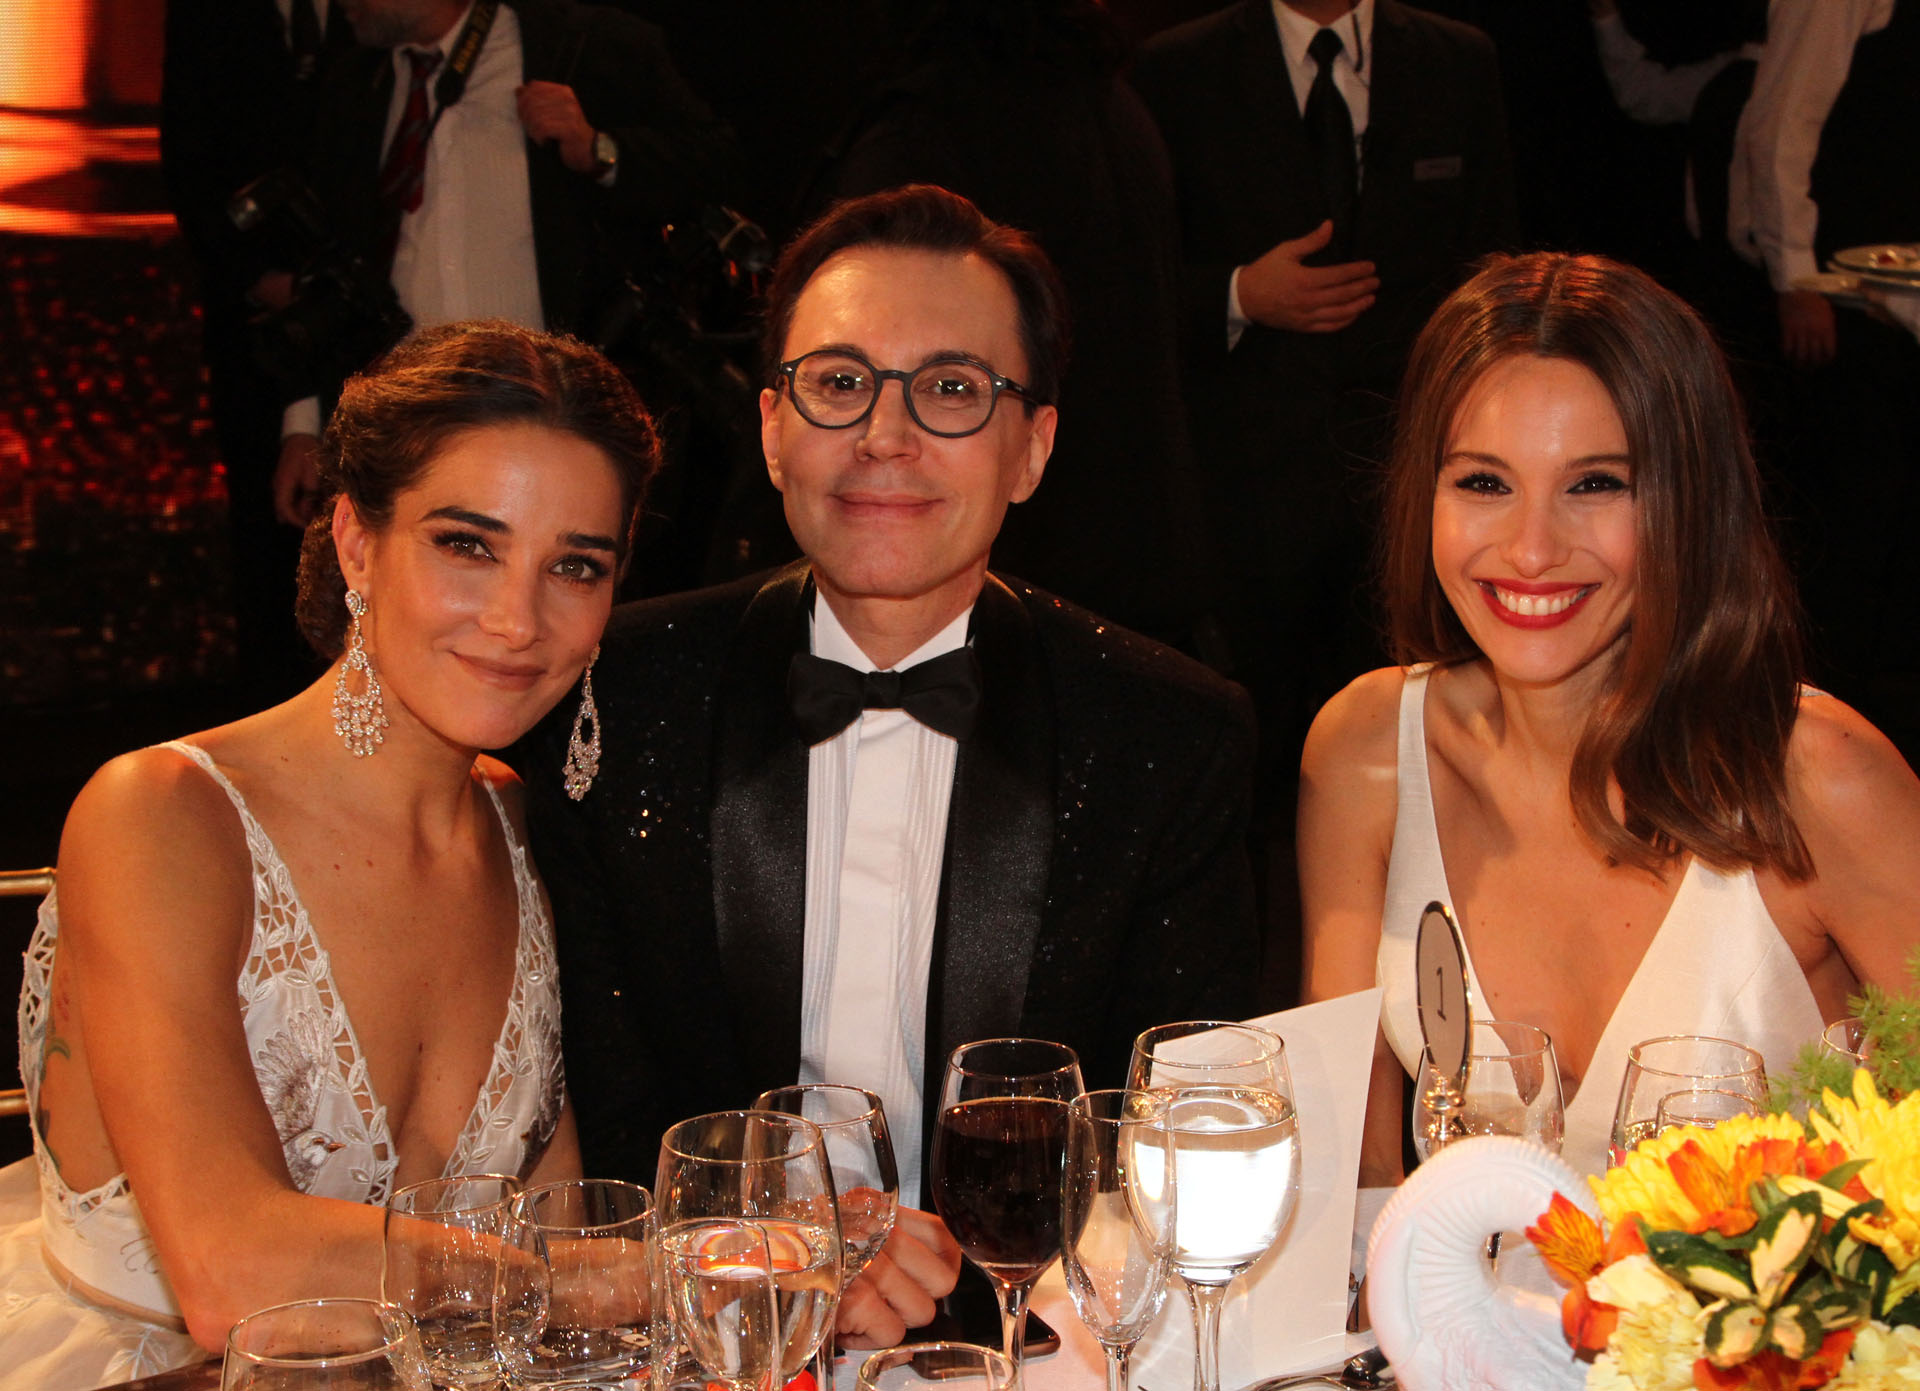 Juana Viale, Marcelo Polino y Pampita